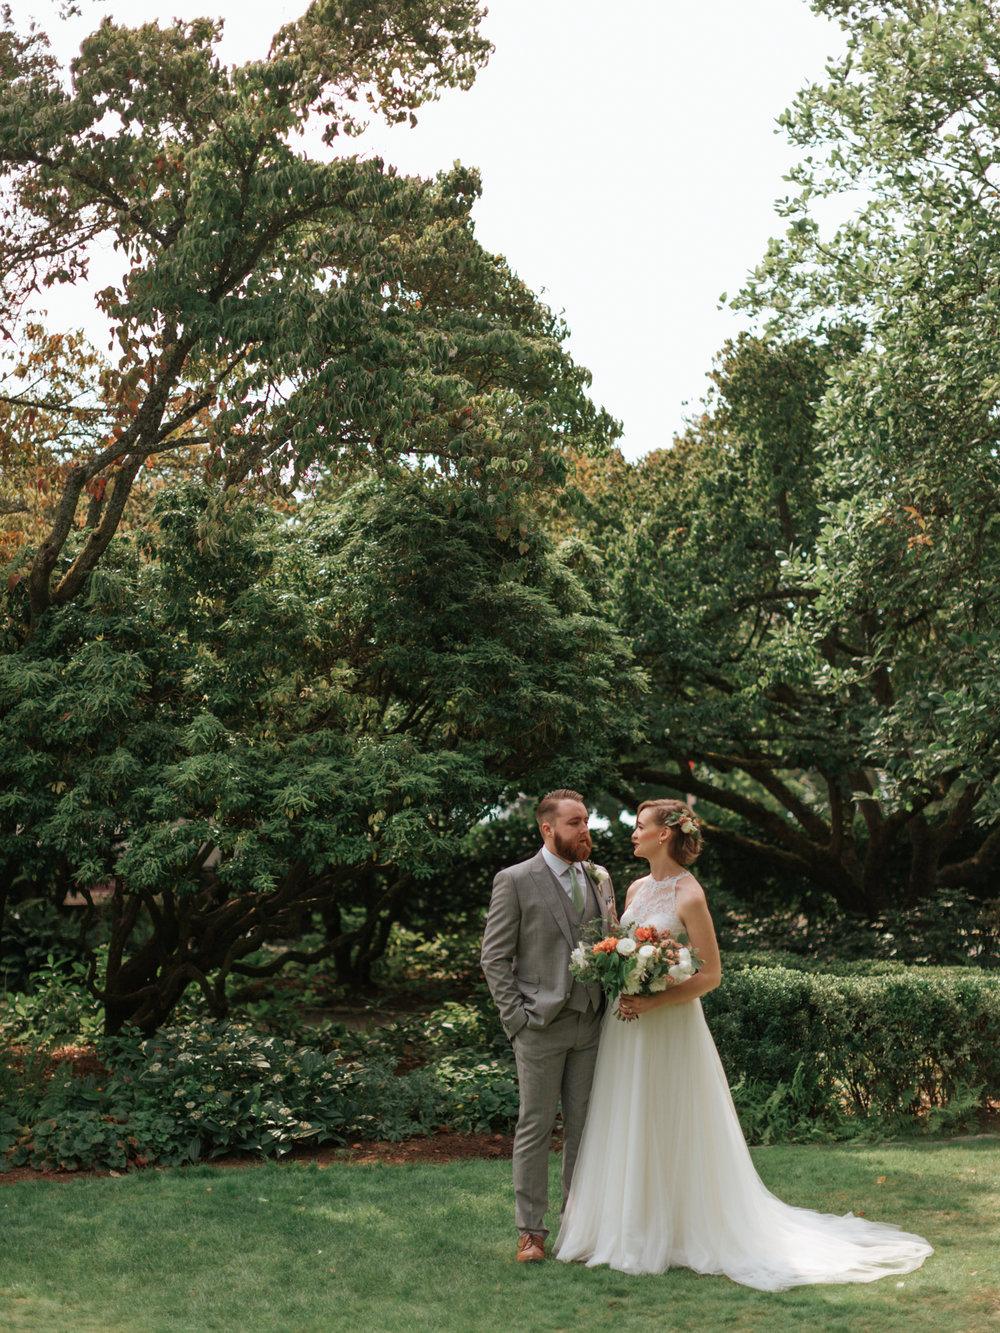 Stolen Glimpses Seattle Wedding Photographer Hidden Meadows Wedding 86.jpg